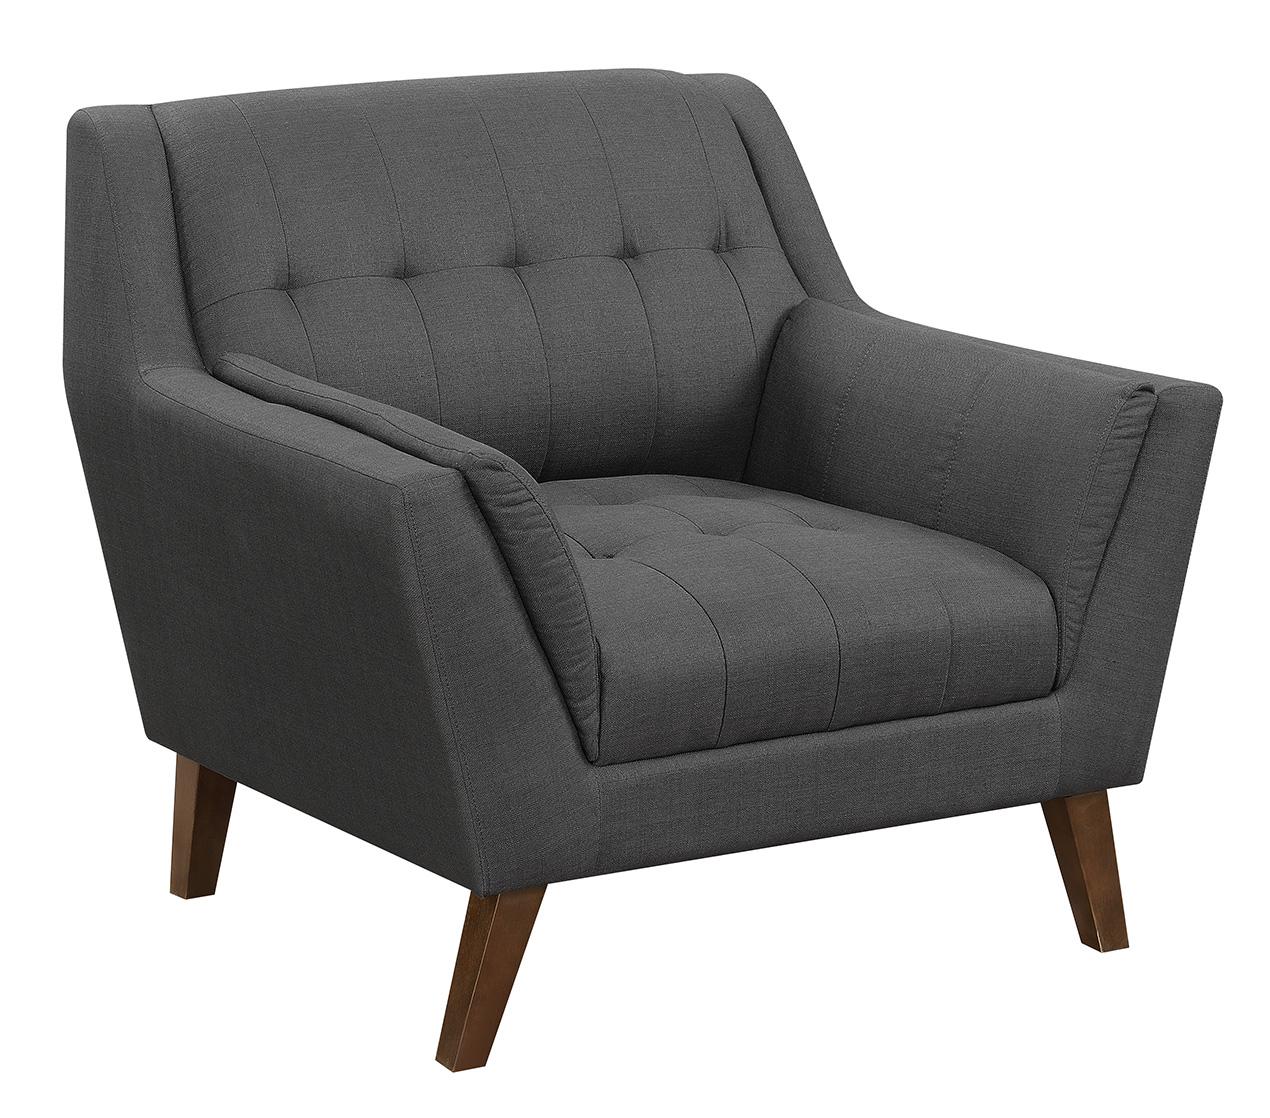 Binetti Accent Chair Charcoal